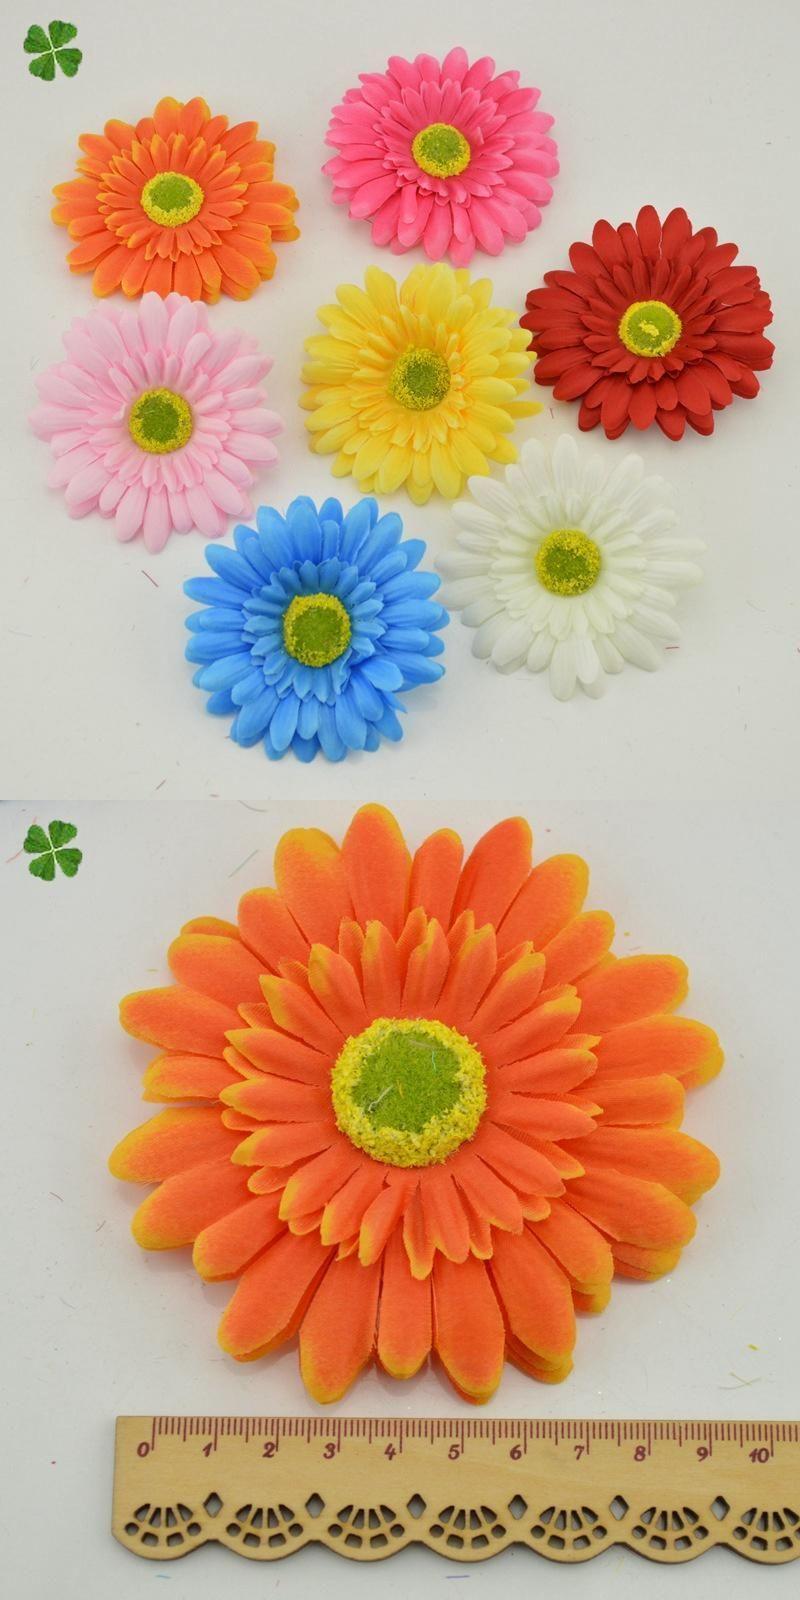 Visit To Buy 9 Cm Daisy Silk Fake Flower Gerbera Artificial Flowers